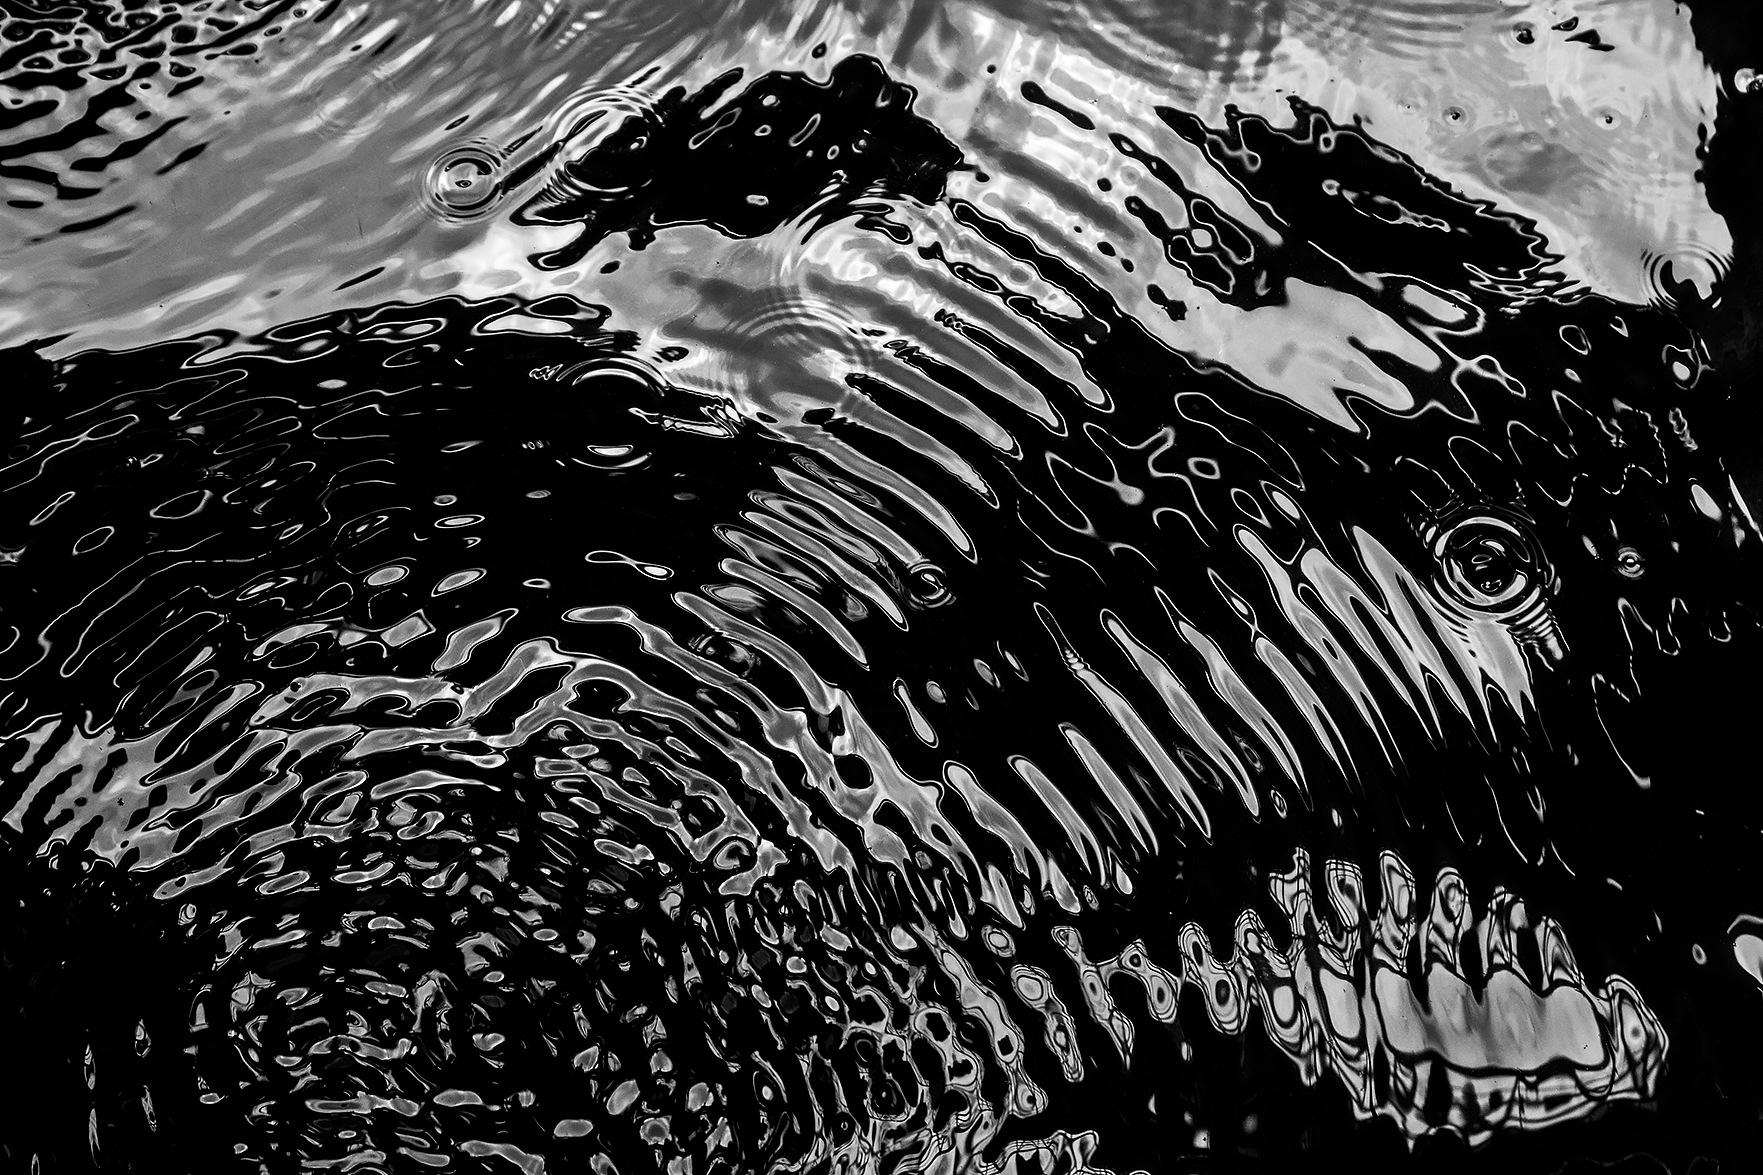 Vibrations on water surface by Domas Rakauskas